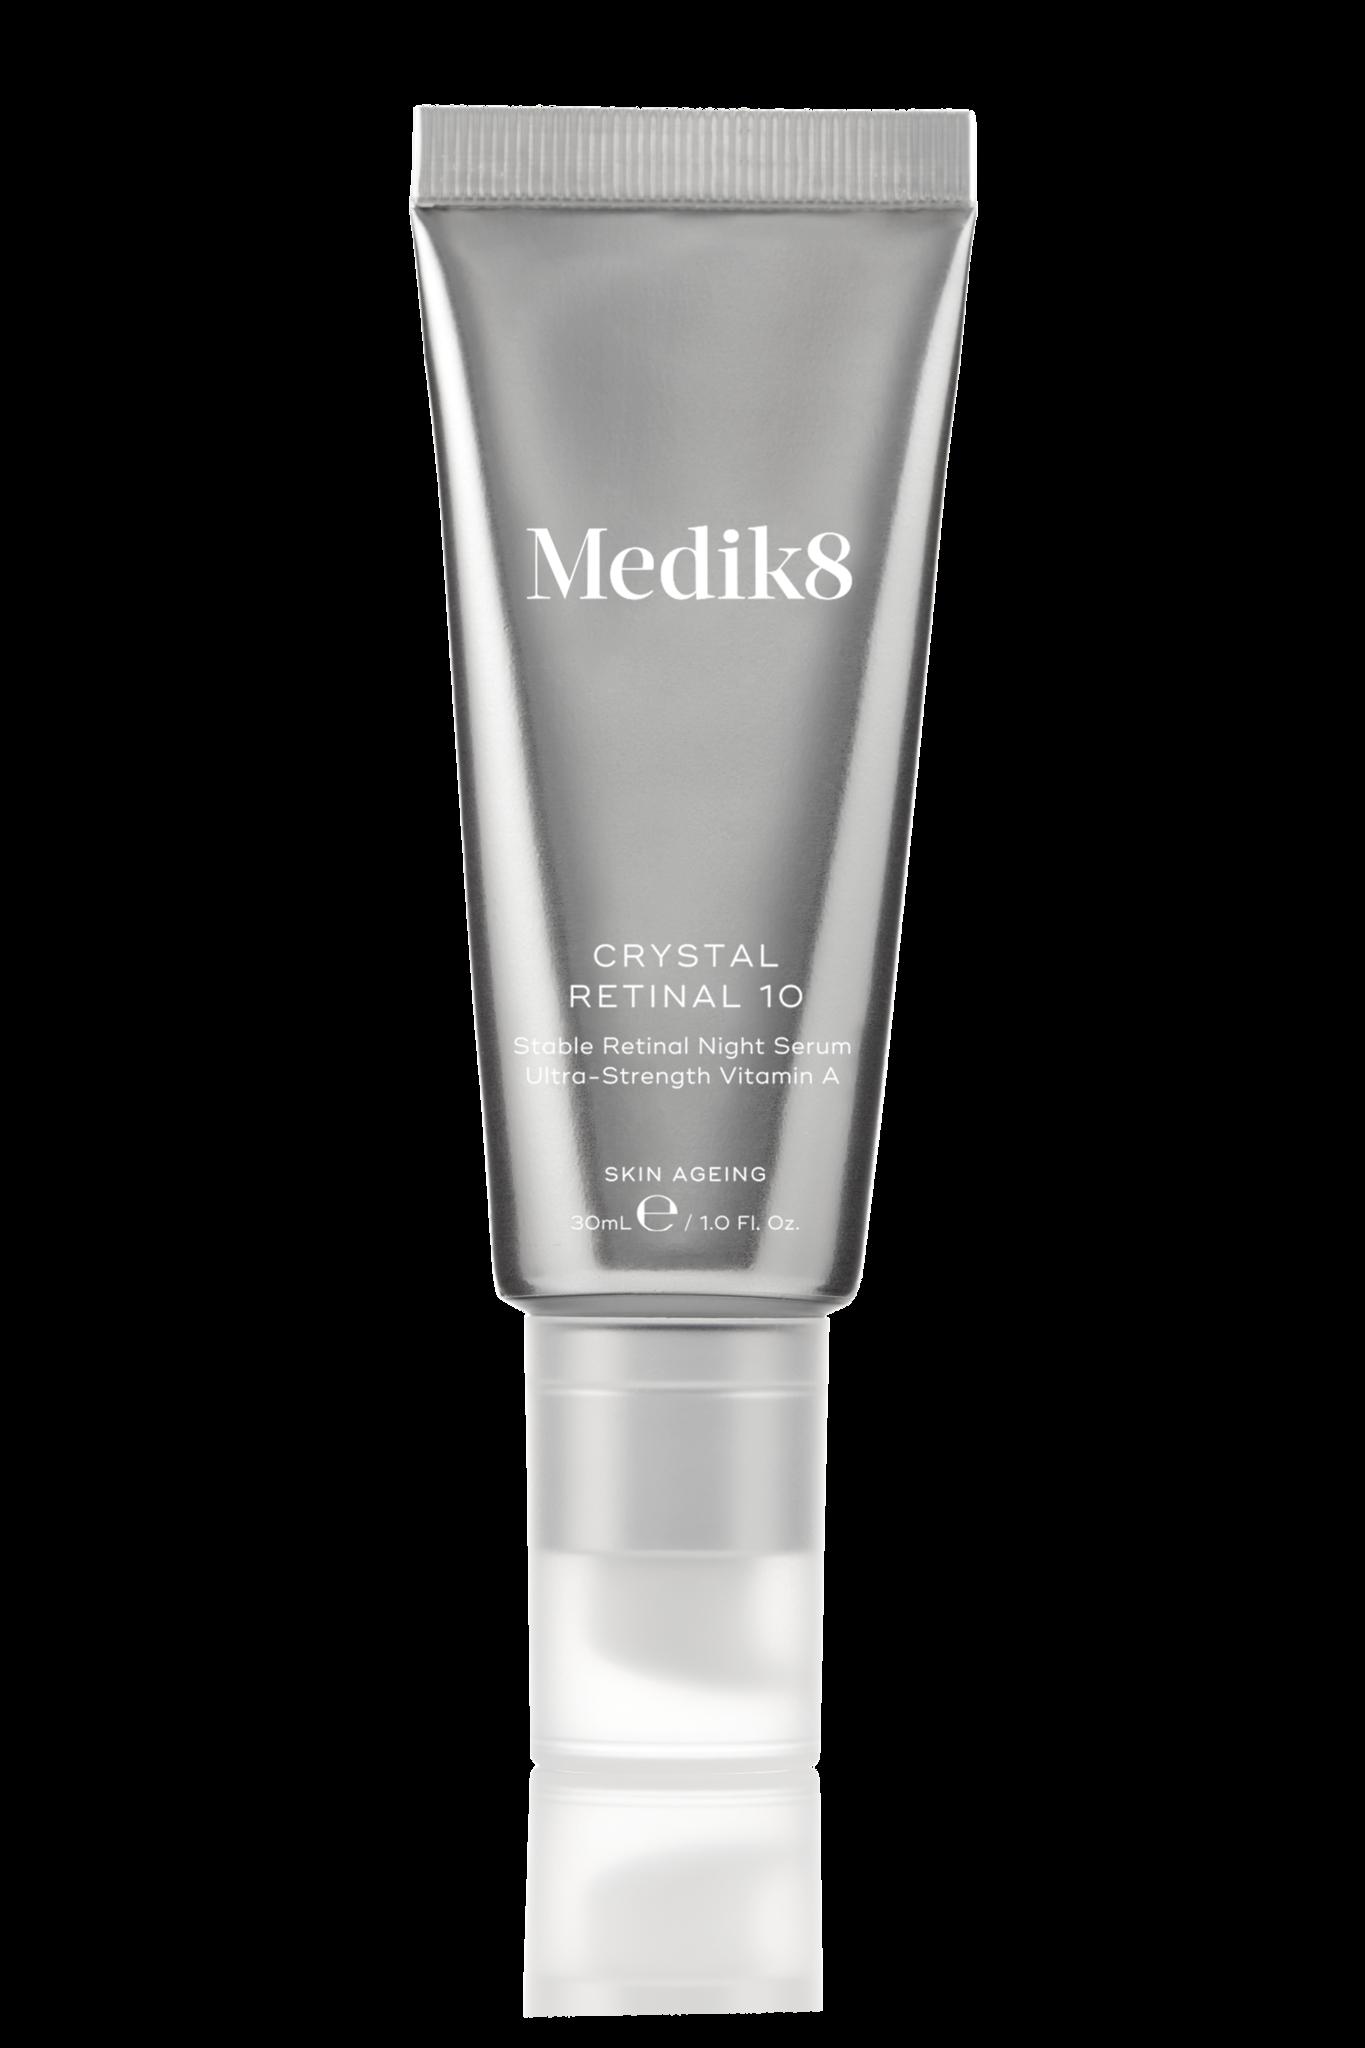 Medik8 Stable Retinal Night Serum Ultra-Strength Vitamin A - Copy